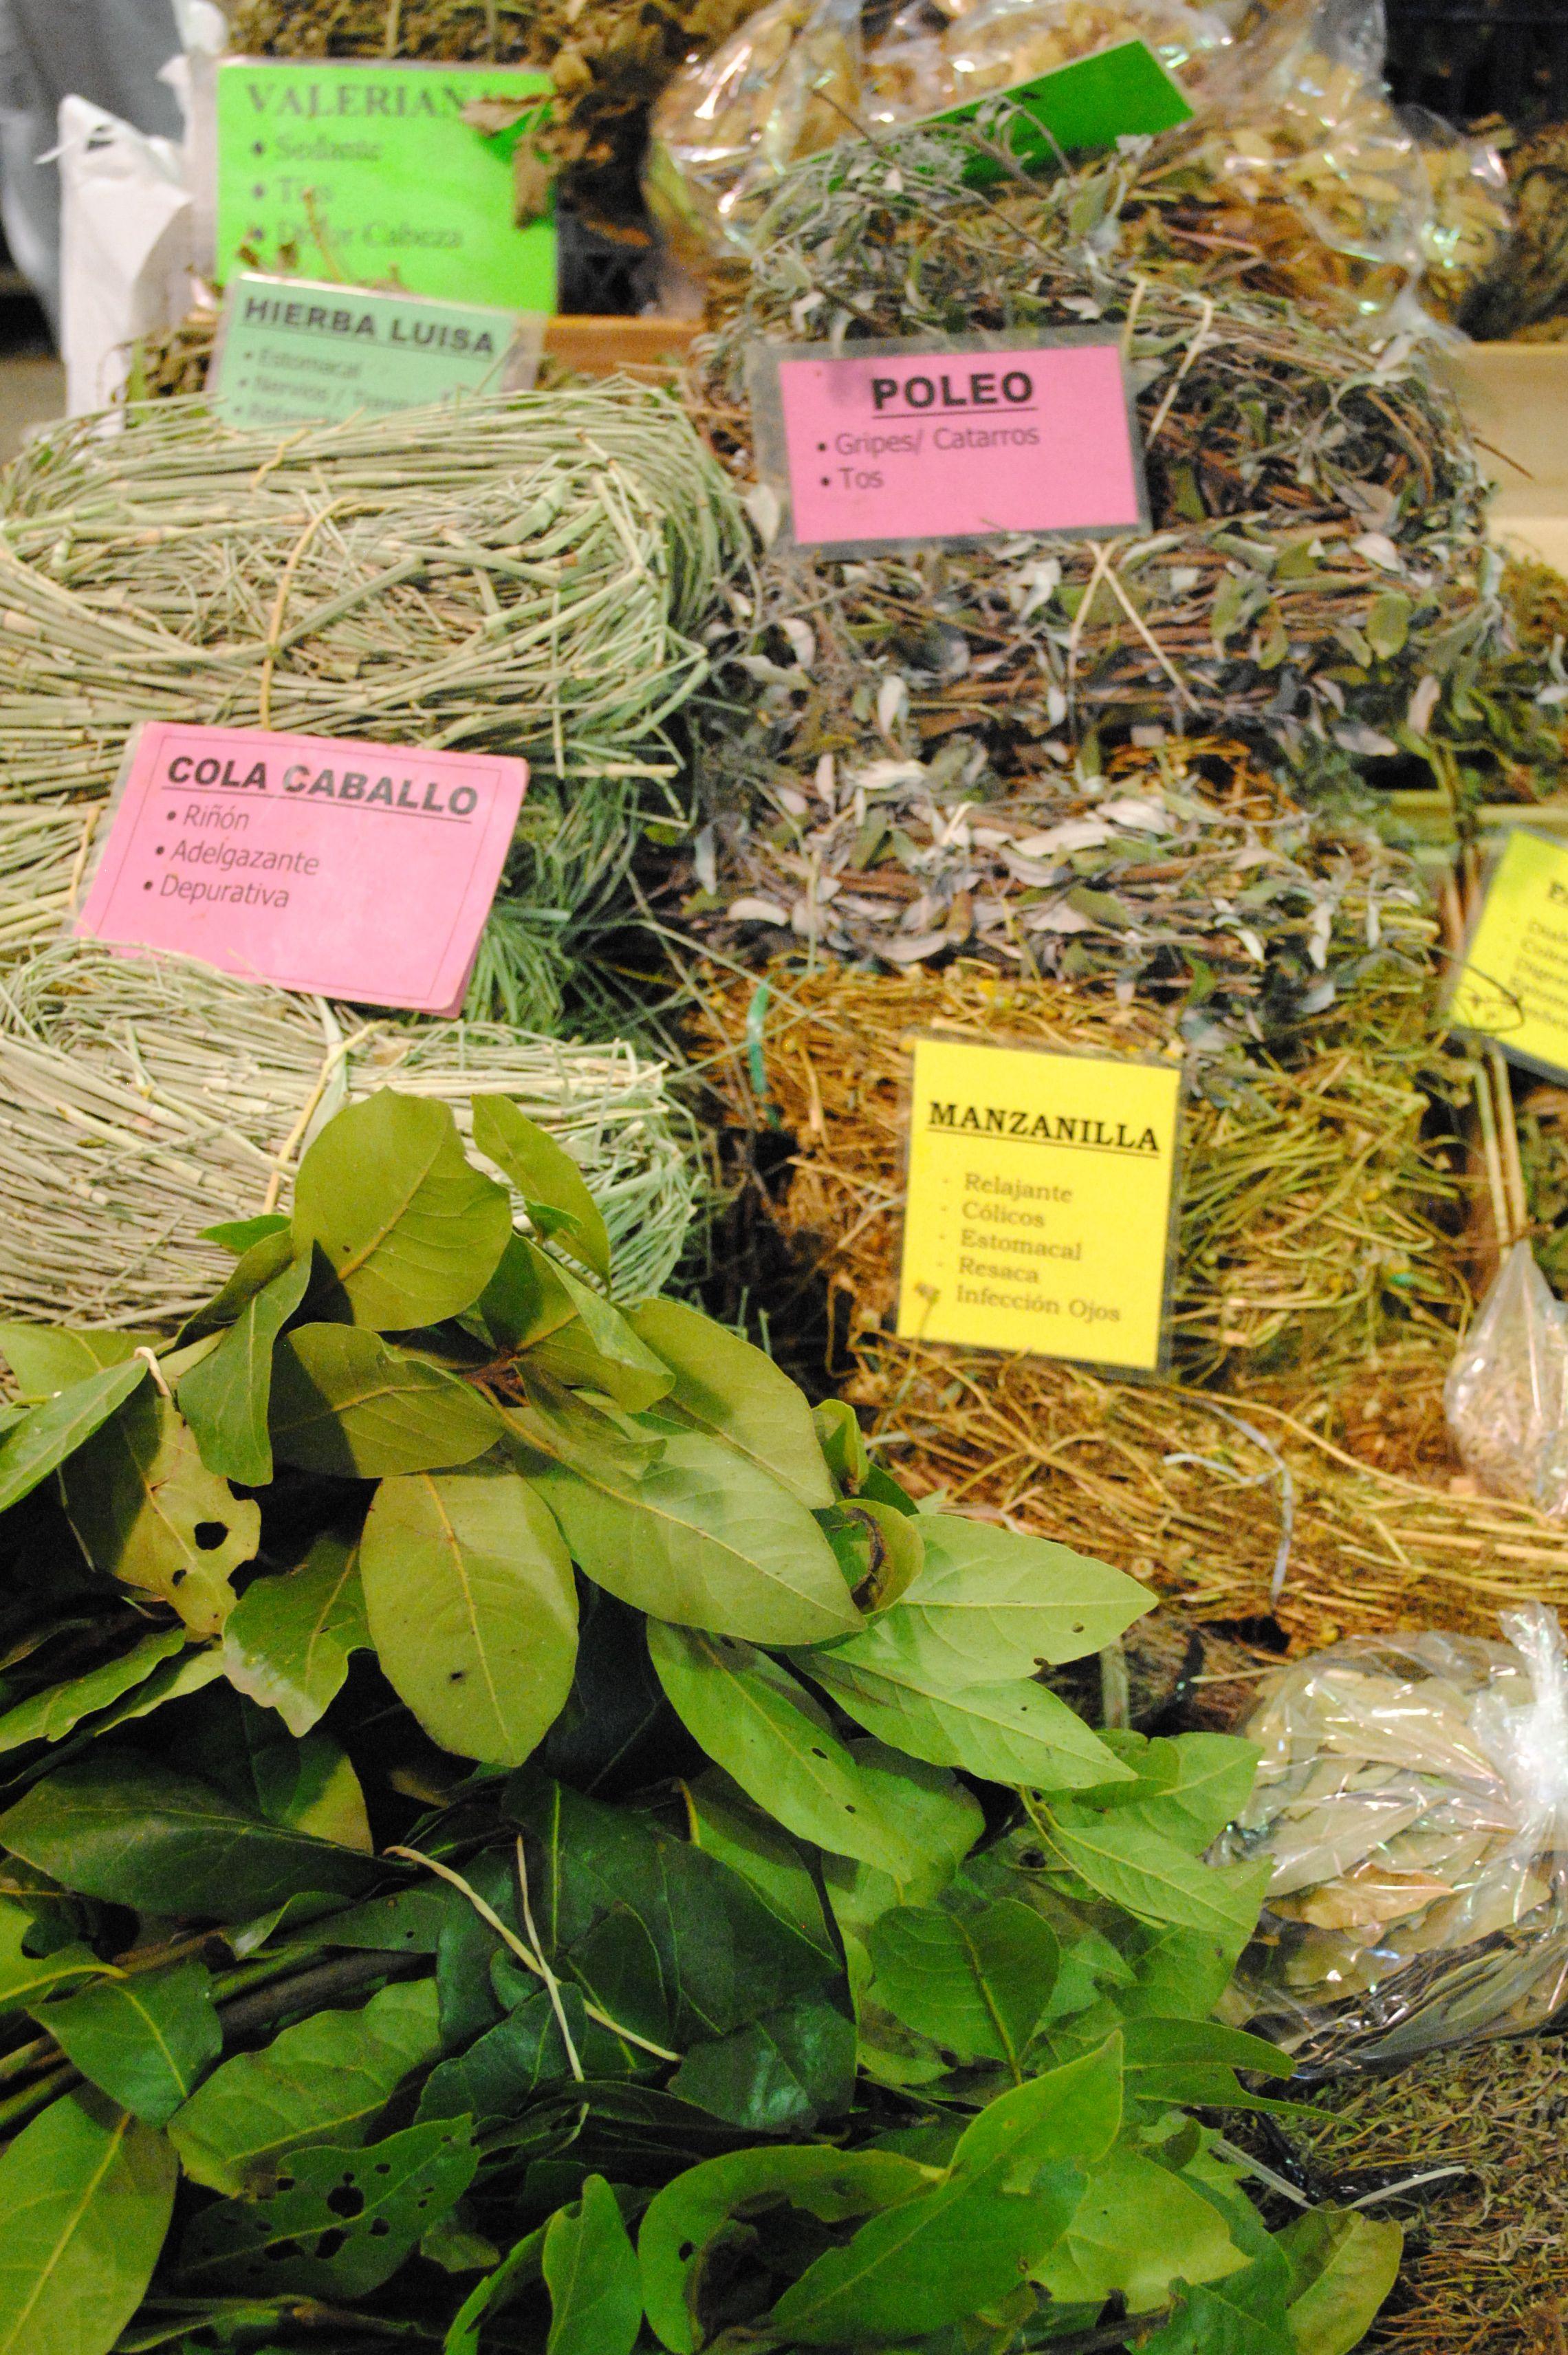 Food market in san mateo fruit vegetable herbs wine etc